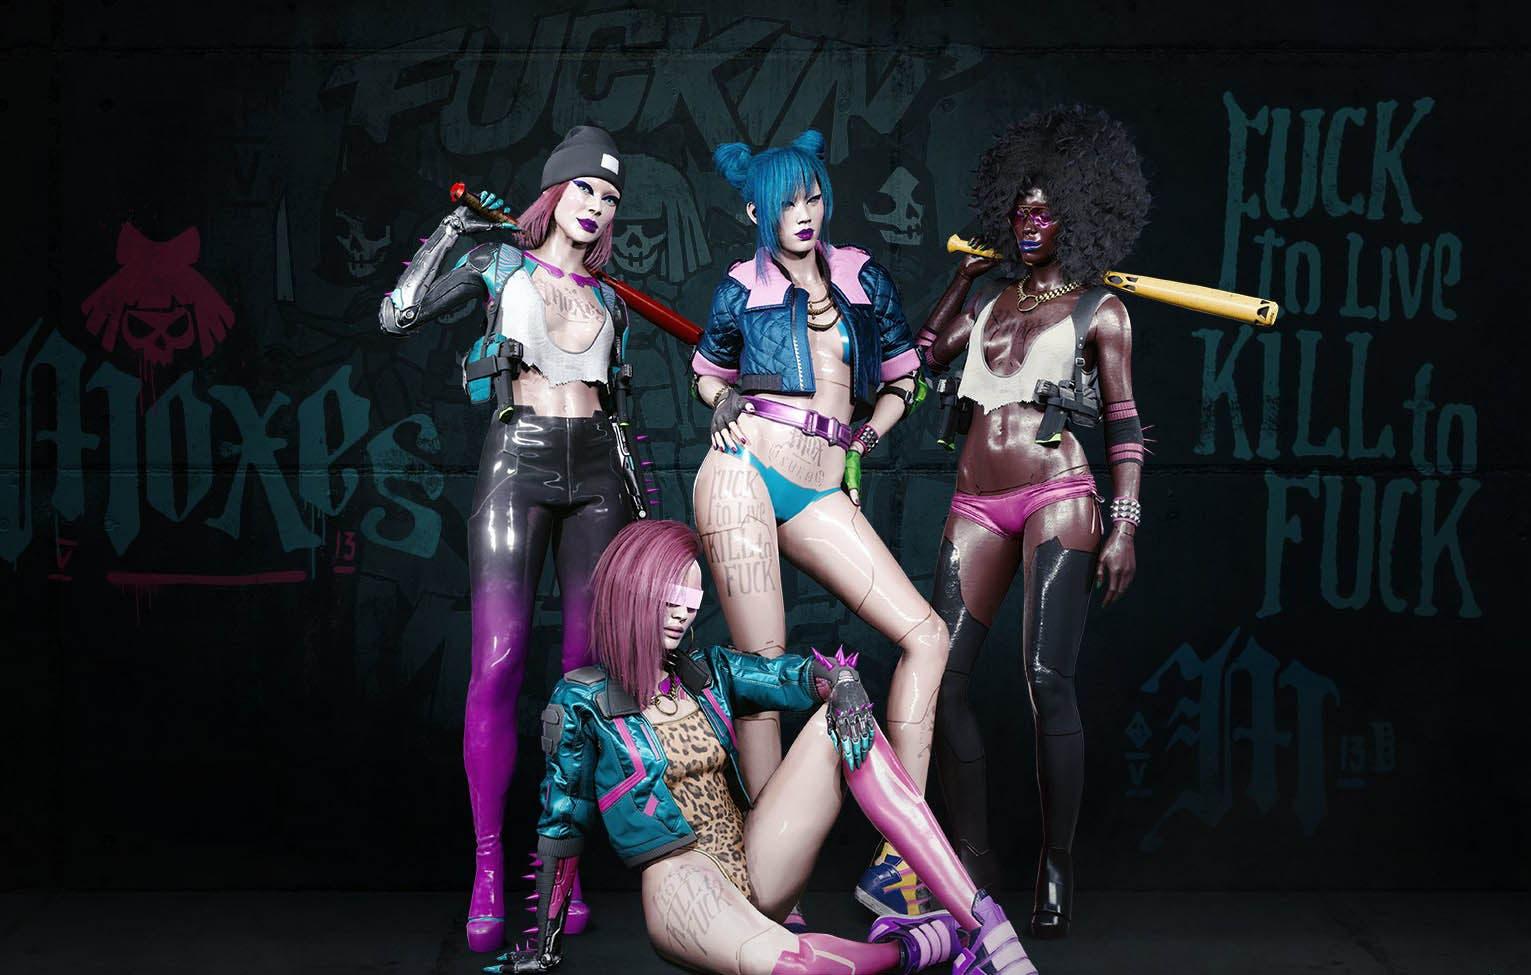 Las bandas de Cyberpunk 2077 protagonizan estos espectaculares fondos de pantalla 5